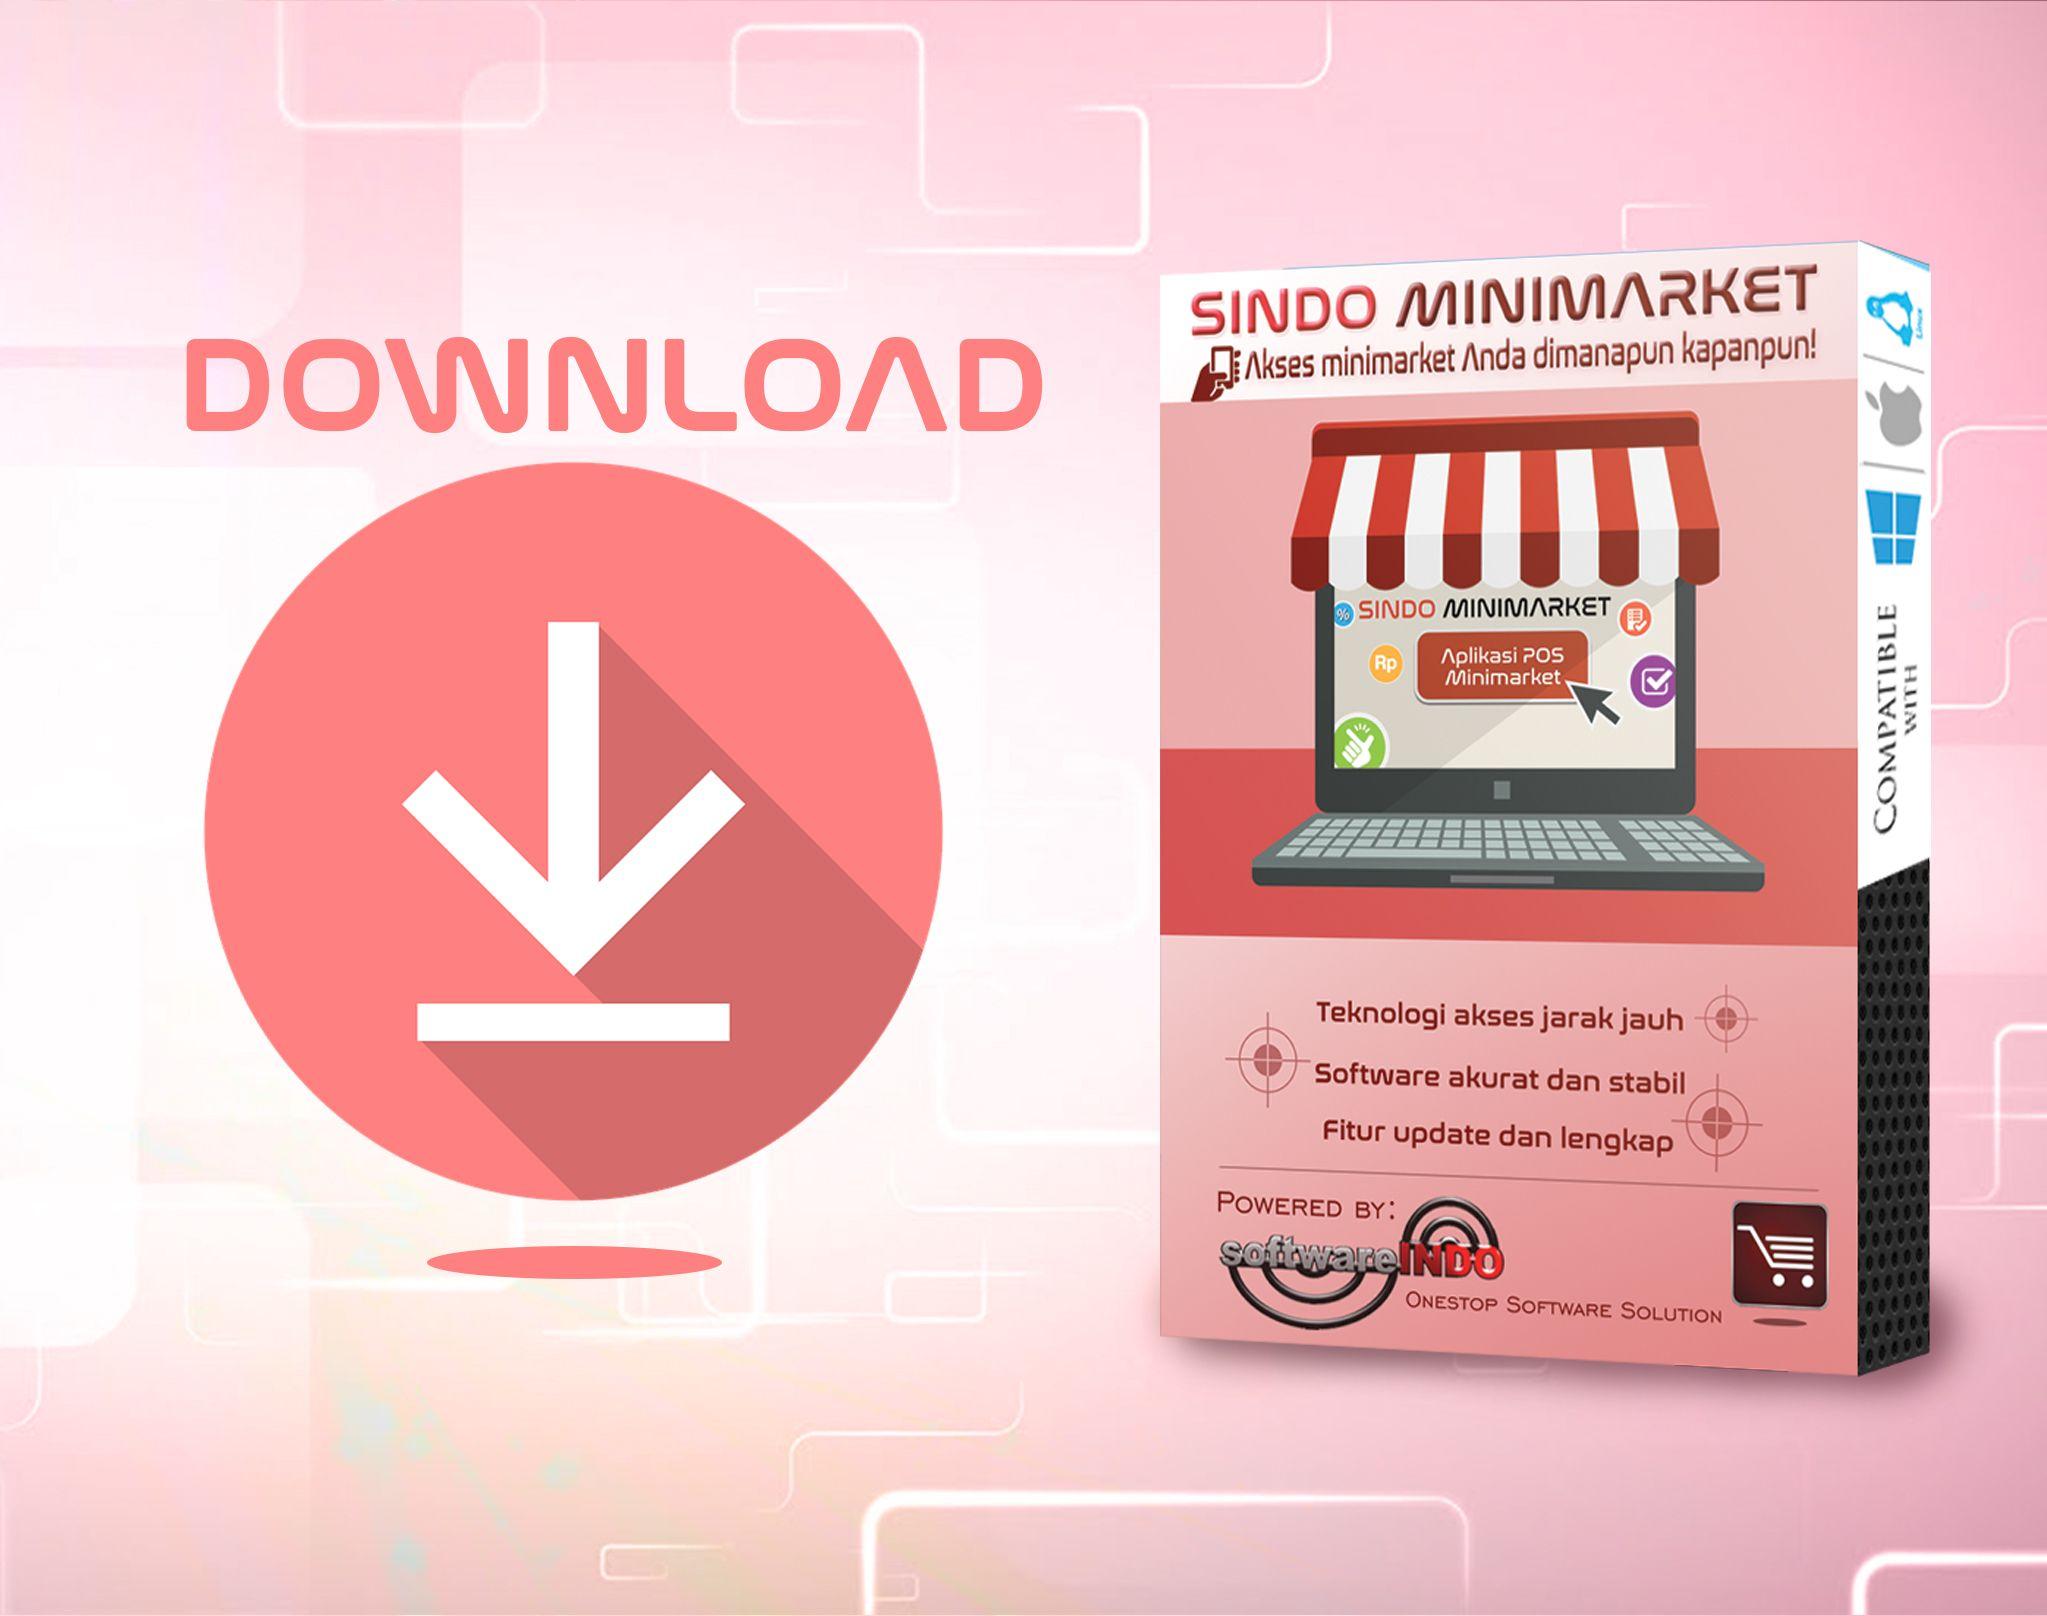 Download Software Minimarket Sindo Minimarket Series Pelayan Beri Gratis